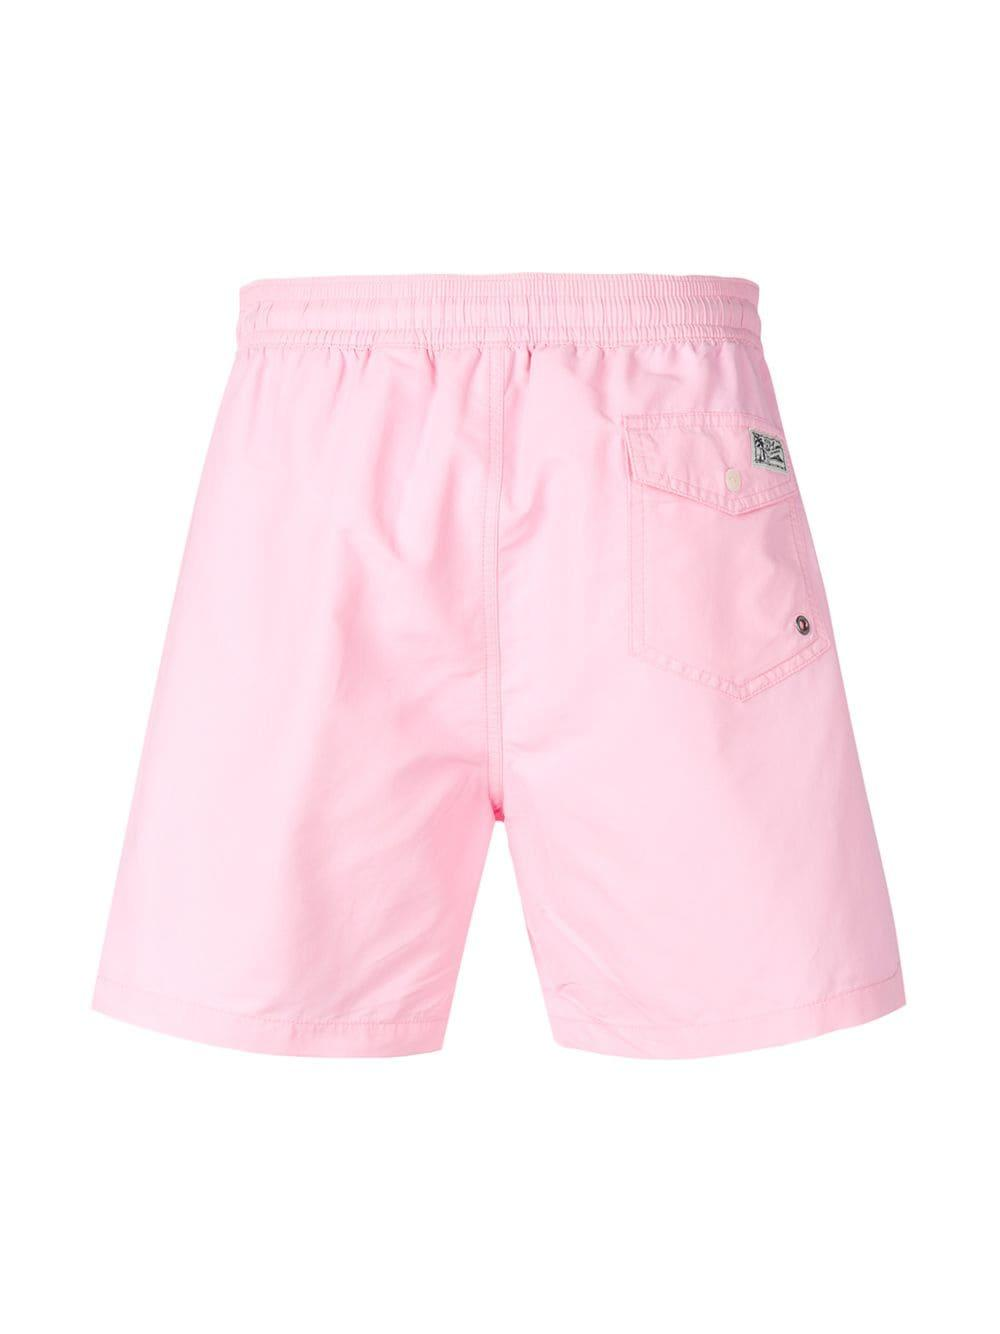 ca6157c5cd Lyst - Polo Ralph Lauren Logo Swimming Shorts in Pink for Men